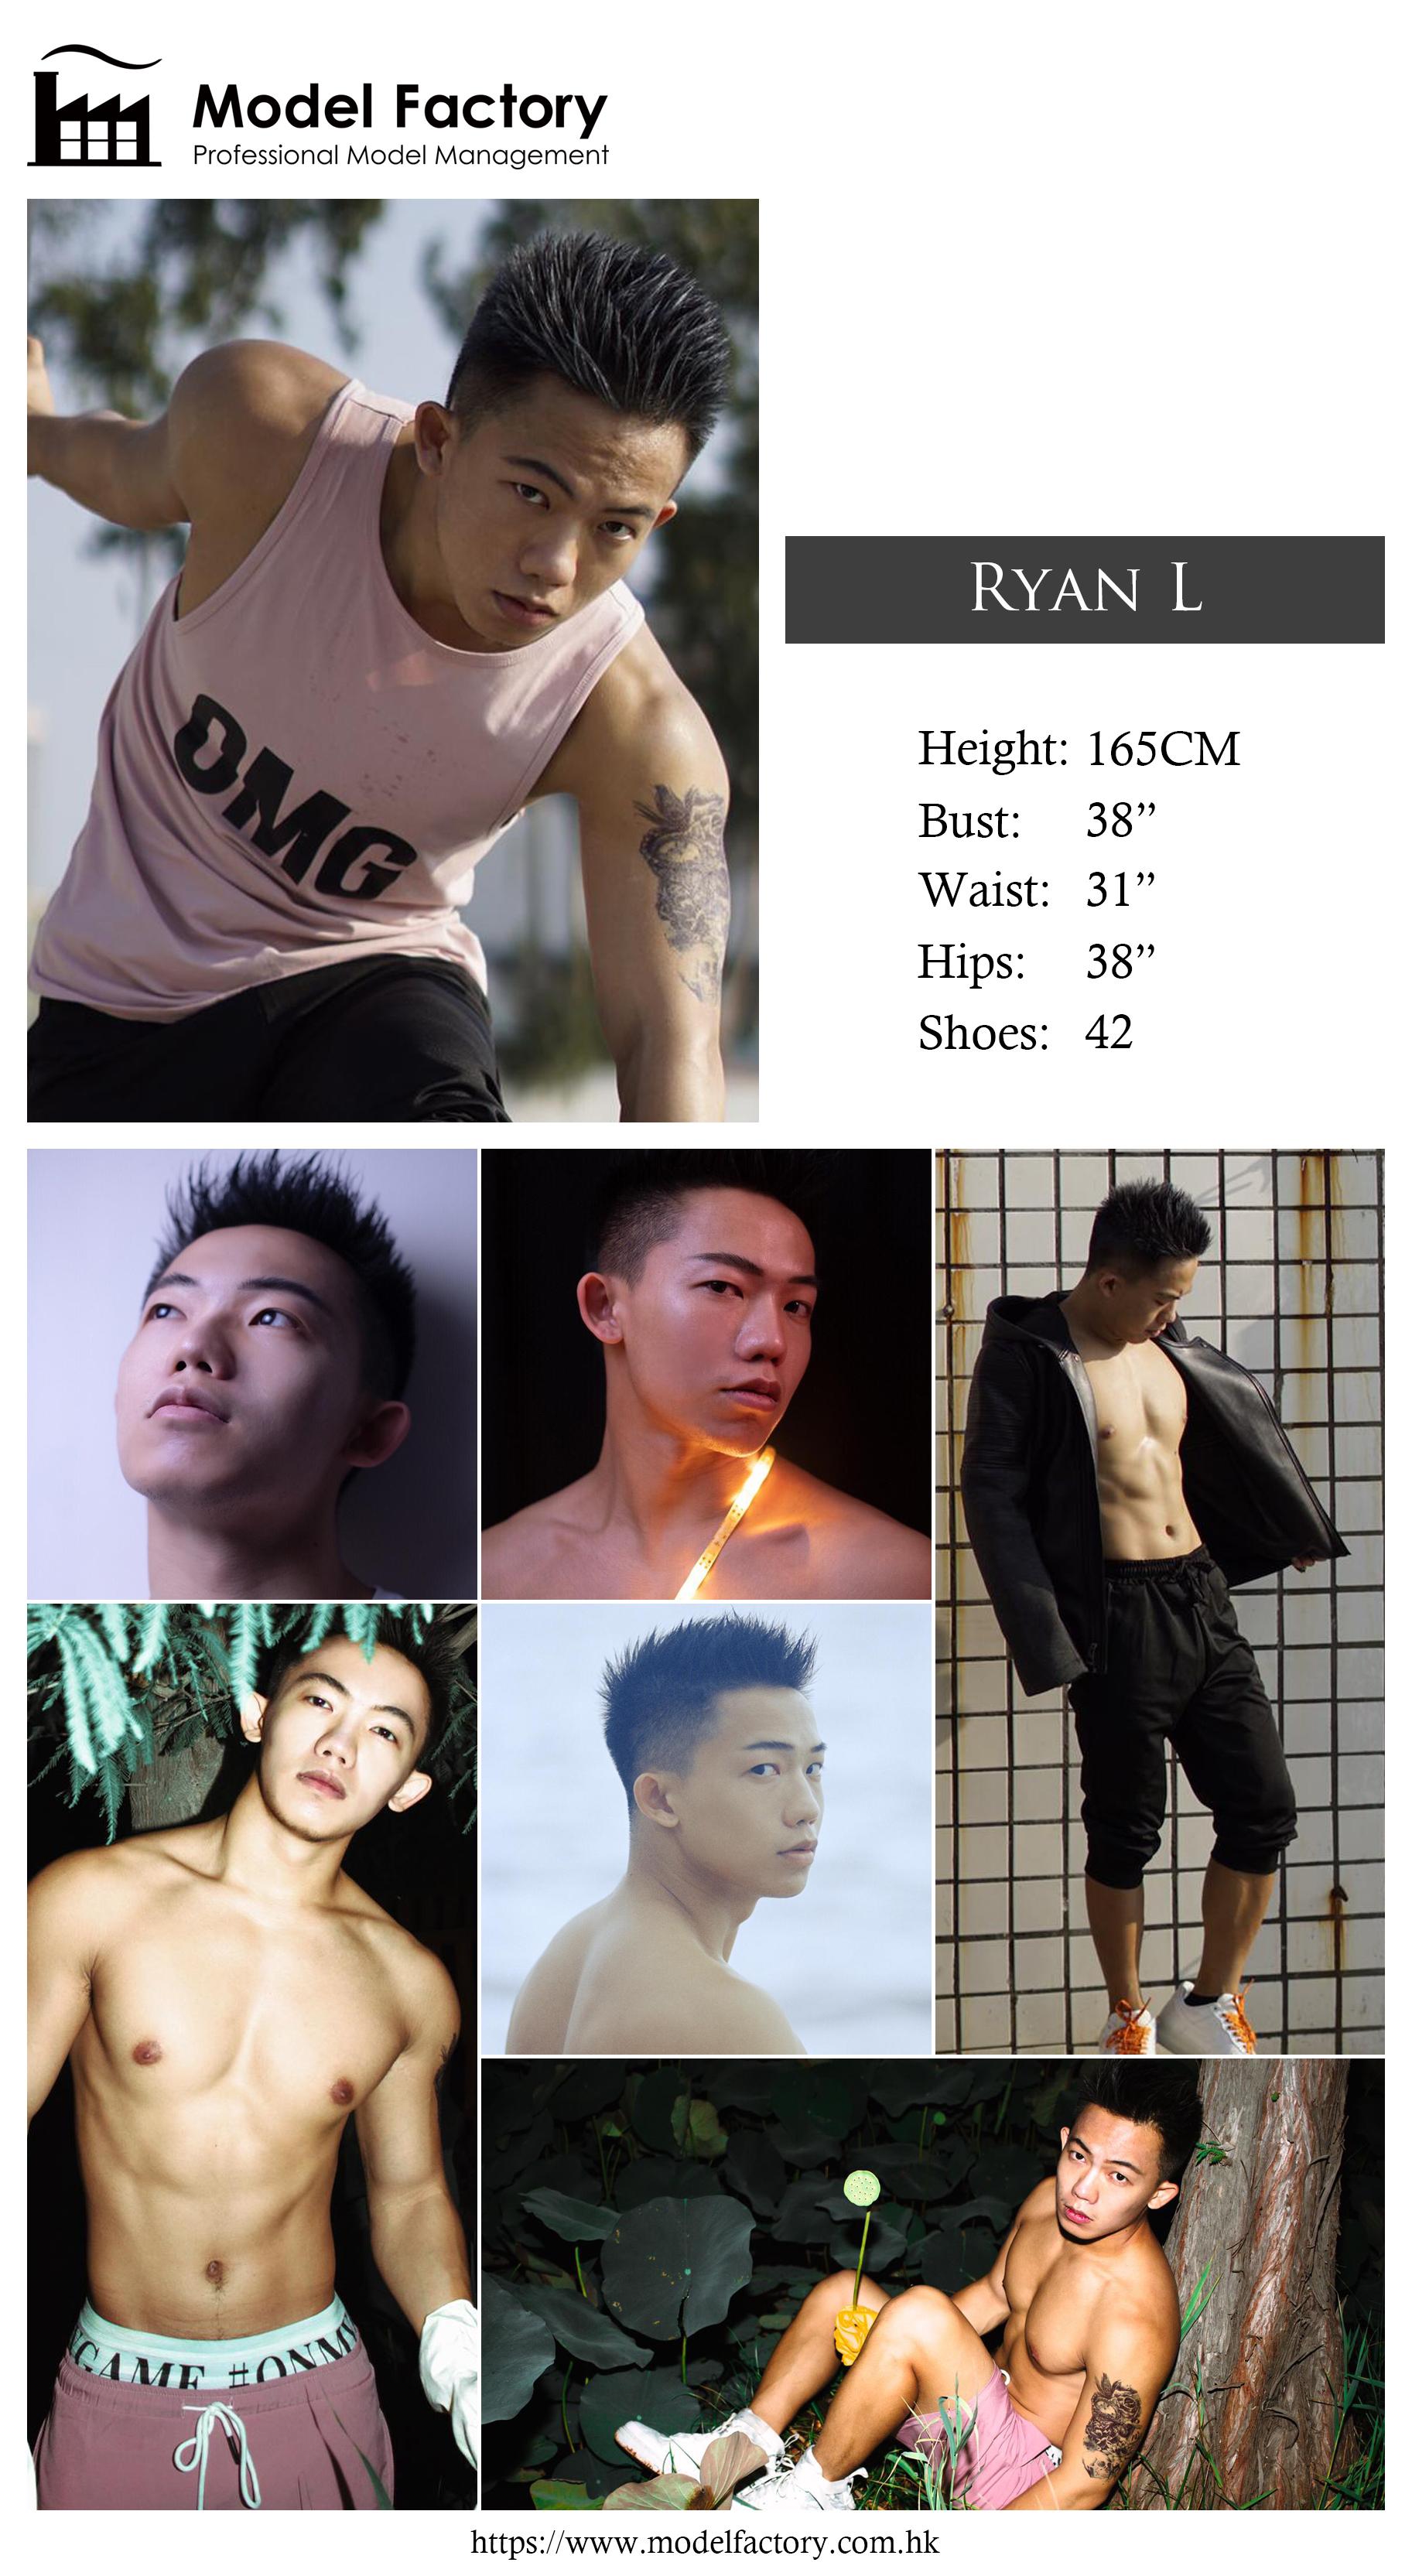 Model Factory Hong Kong Male Model RyanL